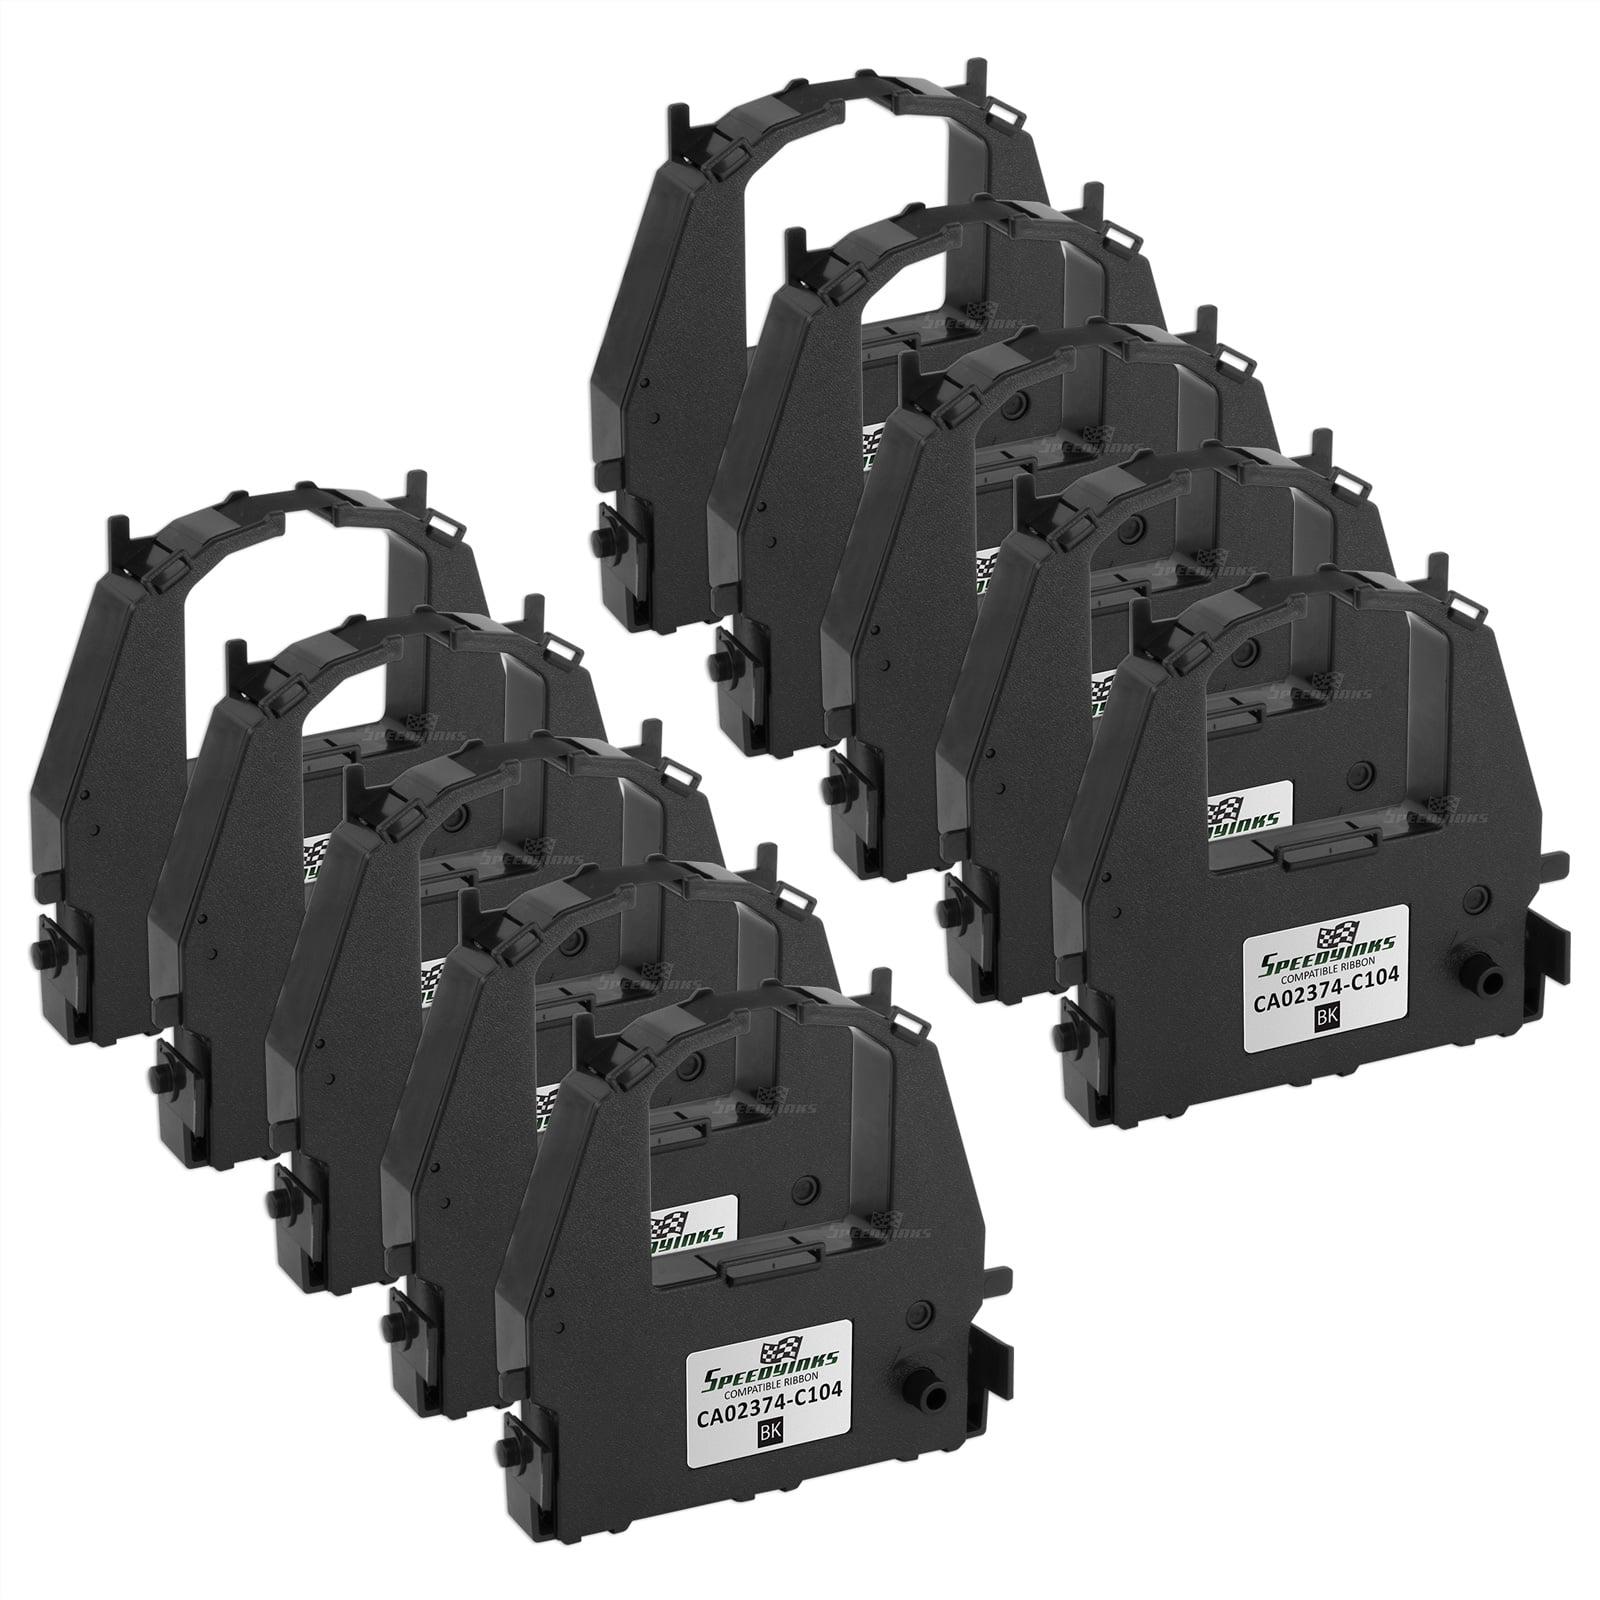 Speedy Inks - 10PK Compatible Fujitsu Black Printer Ribbon, CA02374-C104 for use in Compaq, Fujitsu, Genicom, & TallyGe